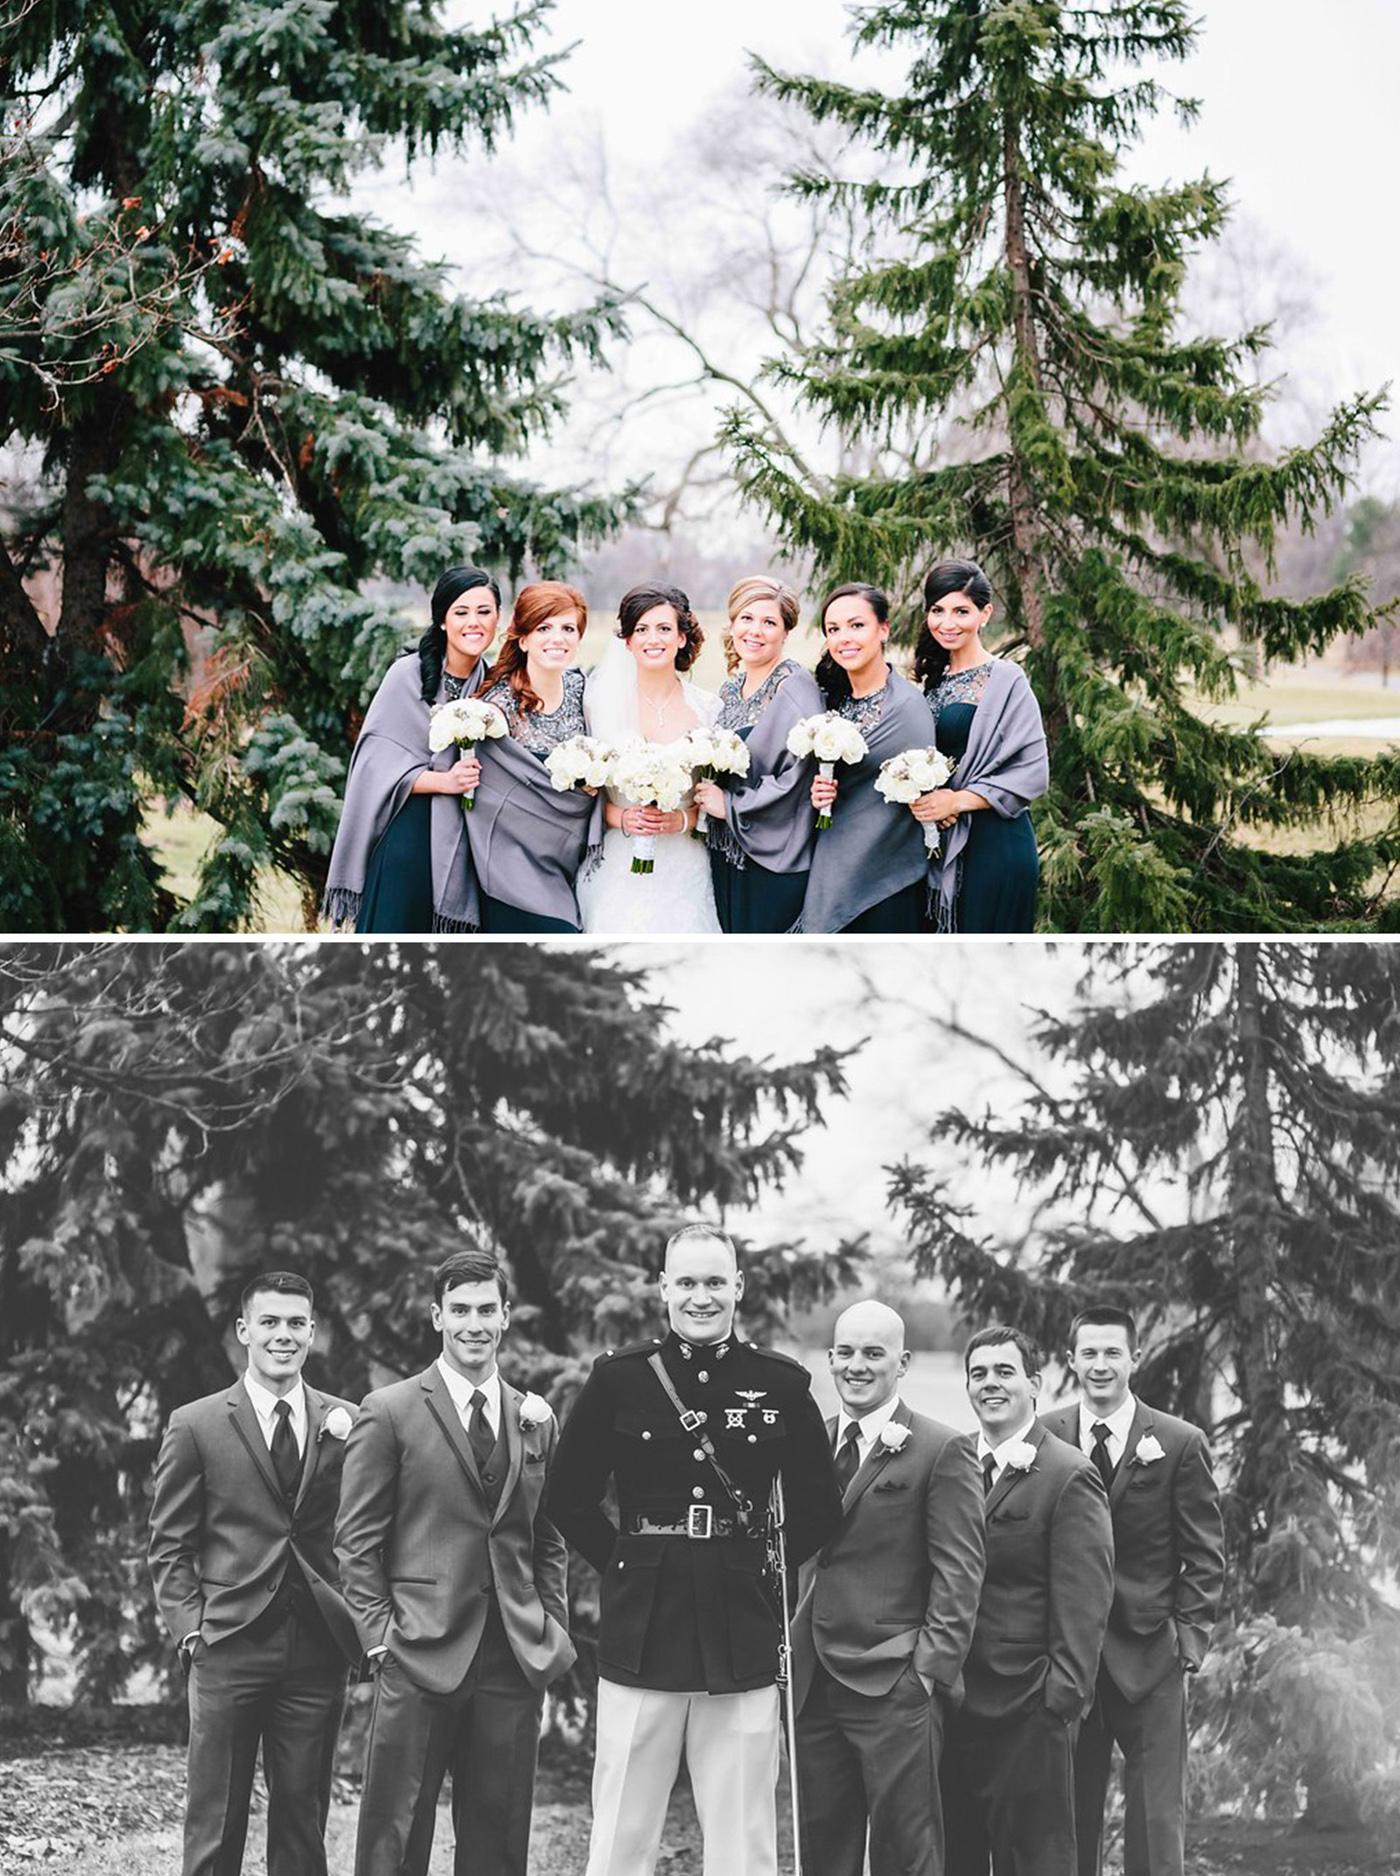 chicago-fine-art-wedding-photography-wesselink4